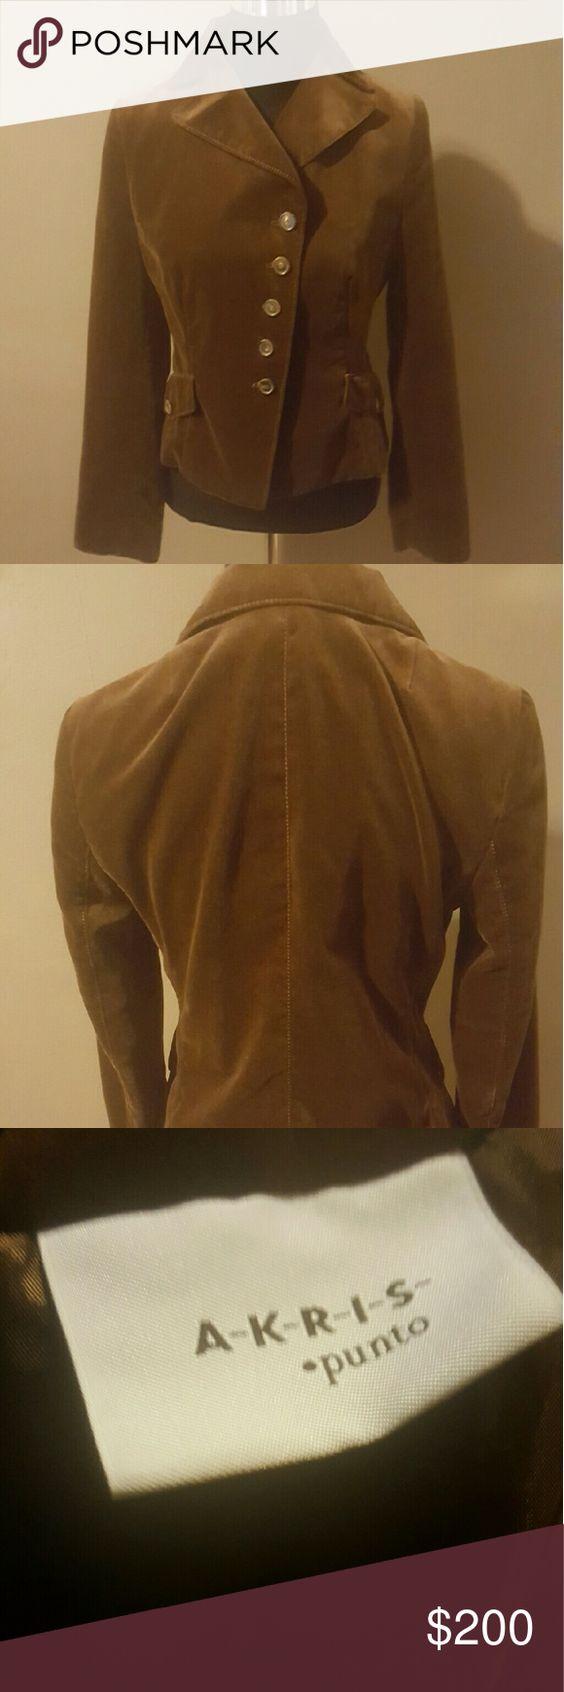 Akris Punto Brown Blazer Size 8 Pre-Loved in great condition Akris Jackets & Coats Blazers